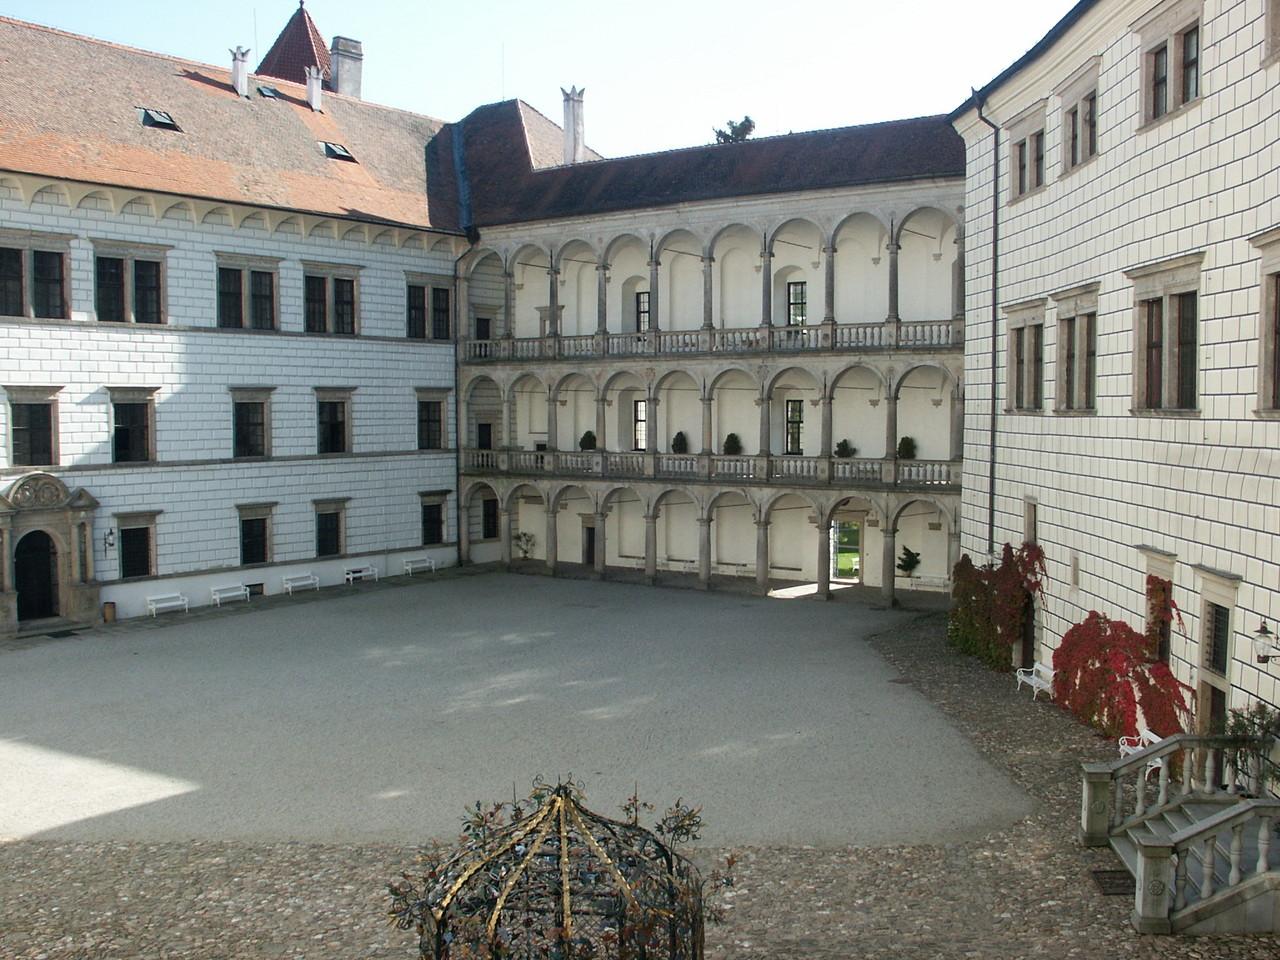 Jindrichuv Hradec